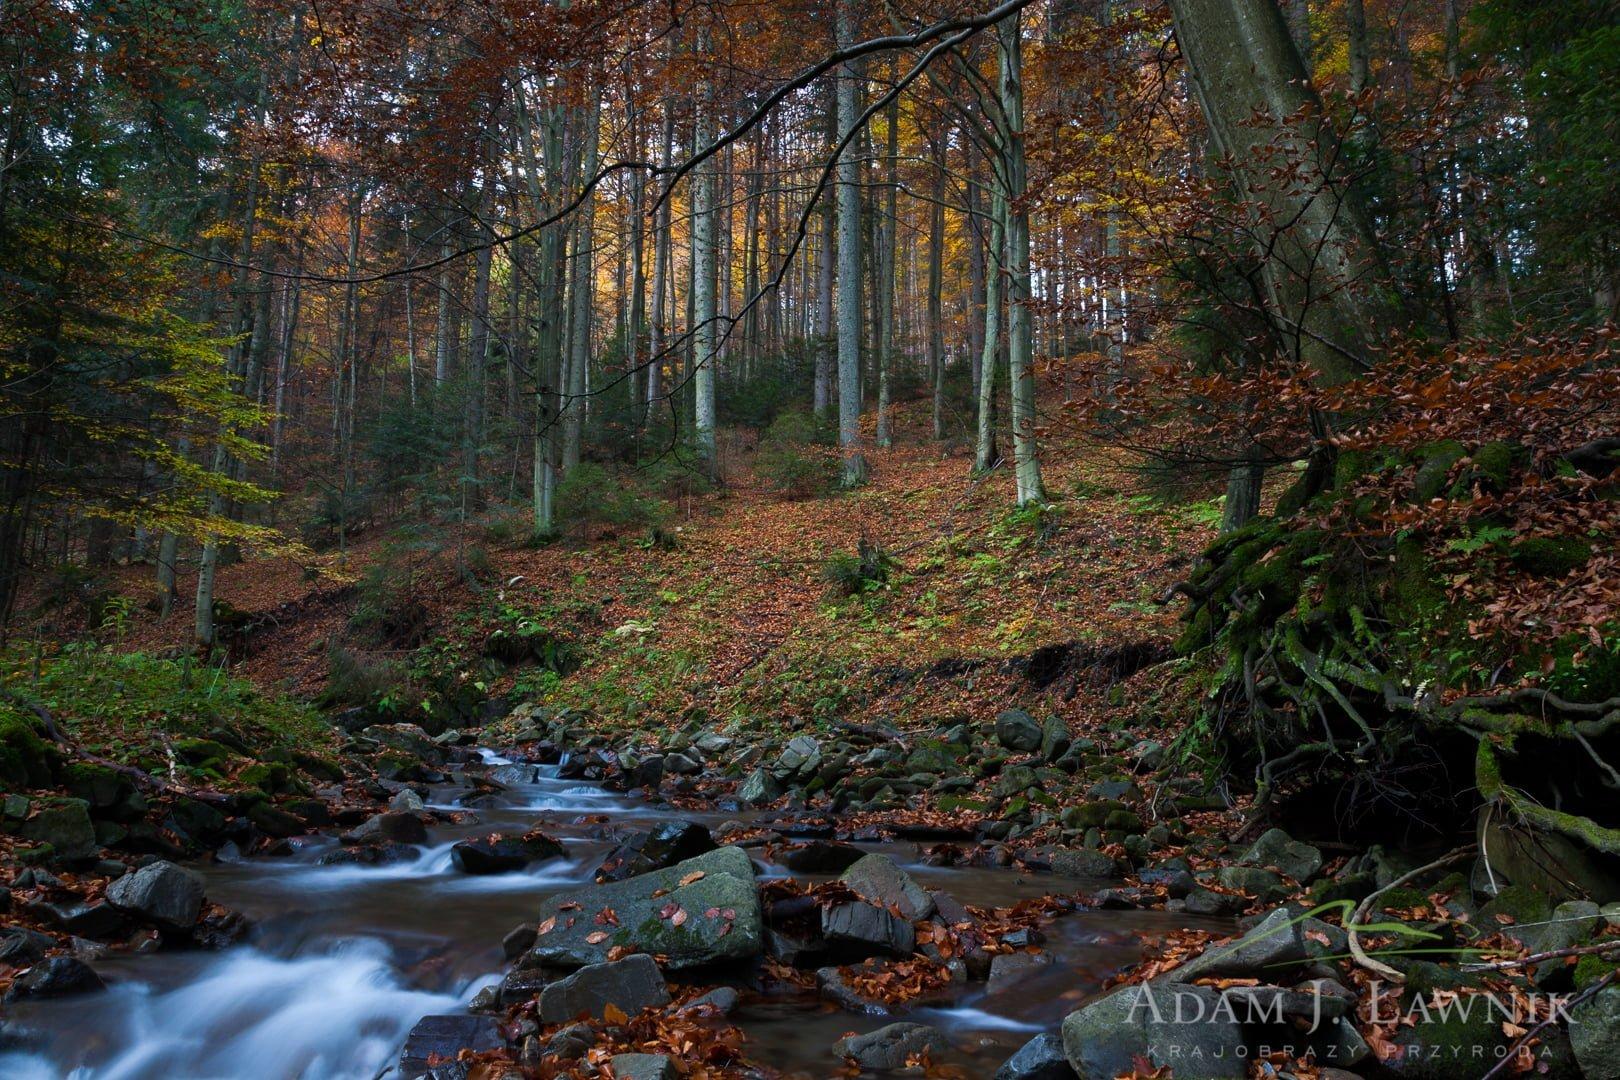 Gorce National Park, Poland 0810-00920C